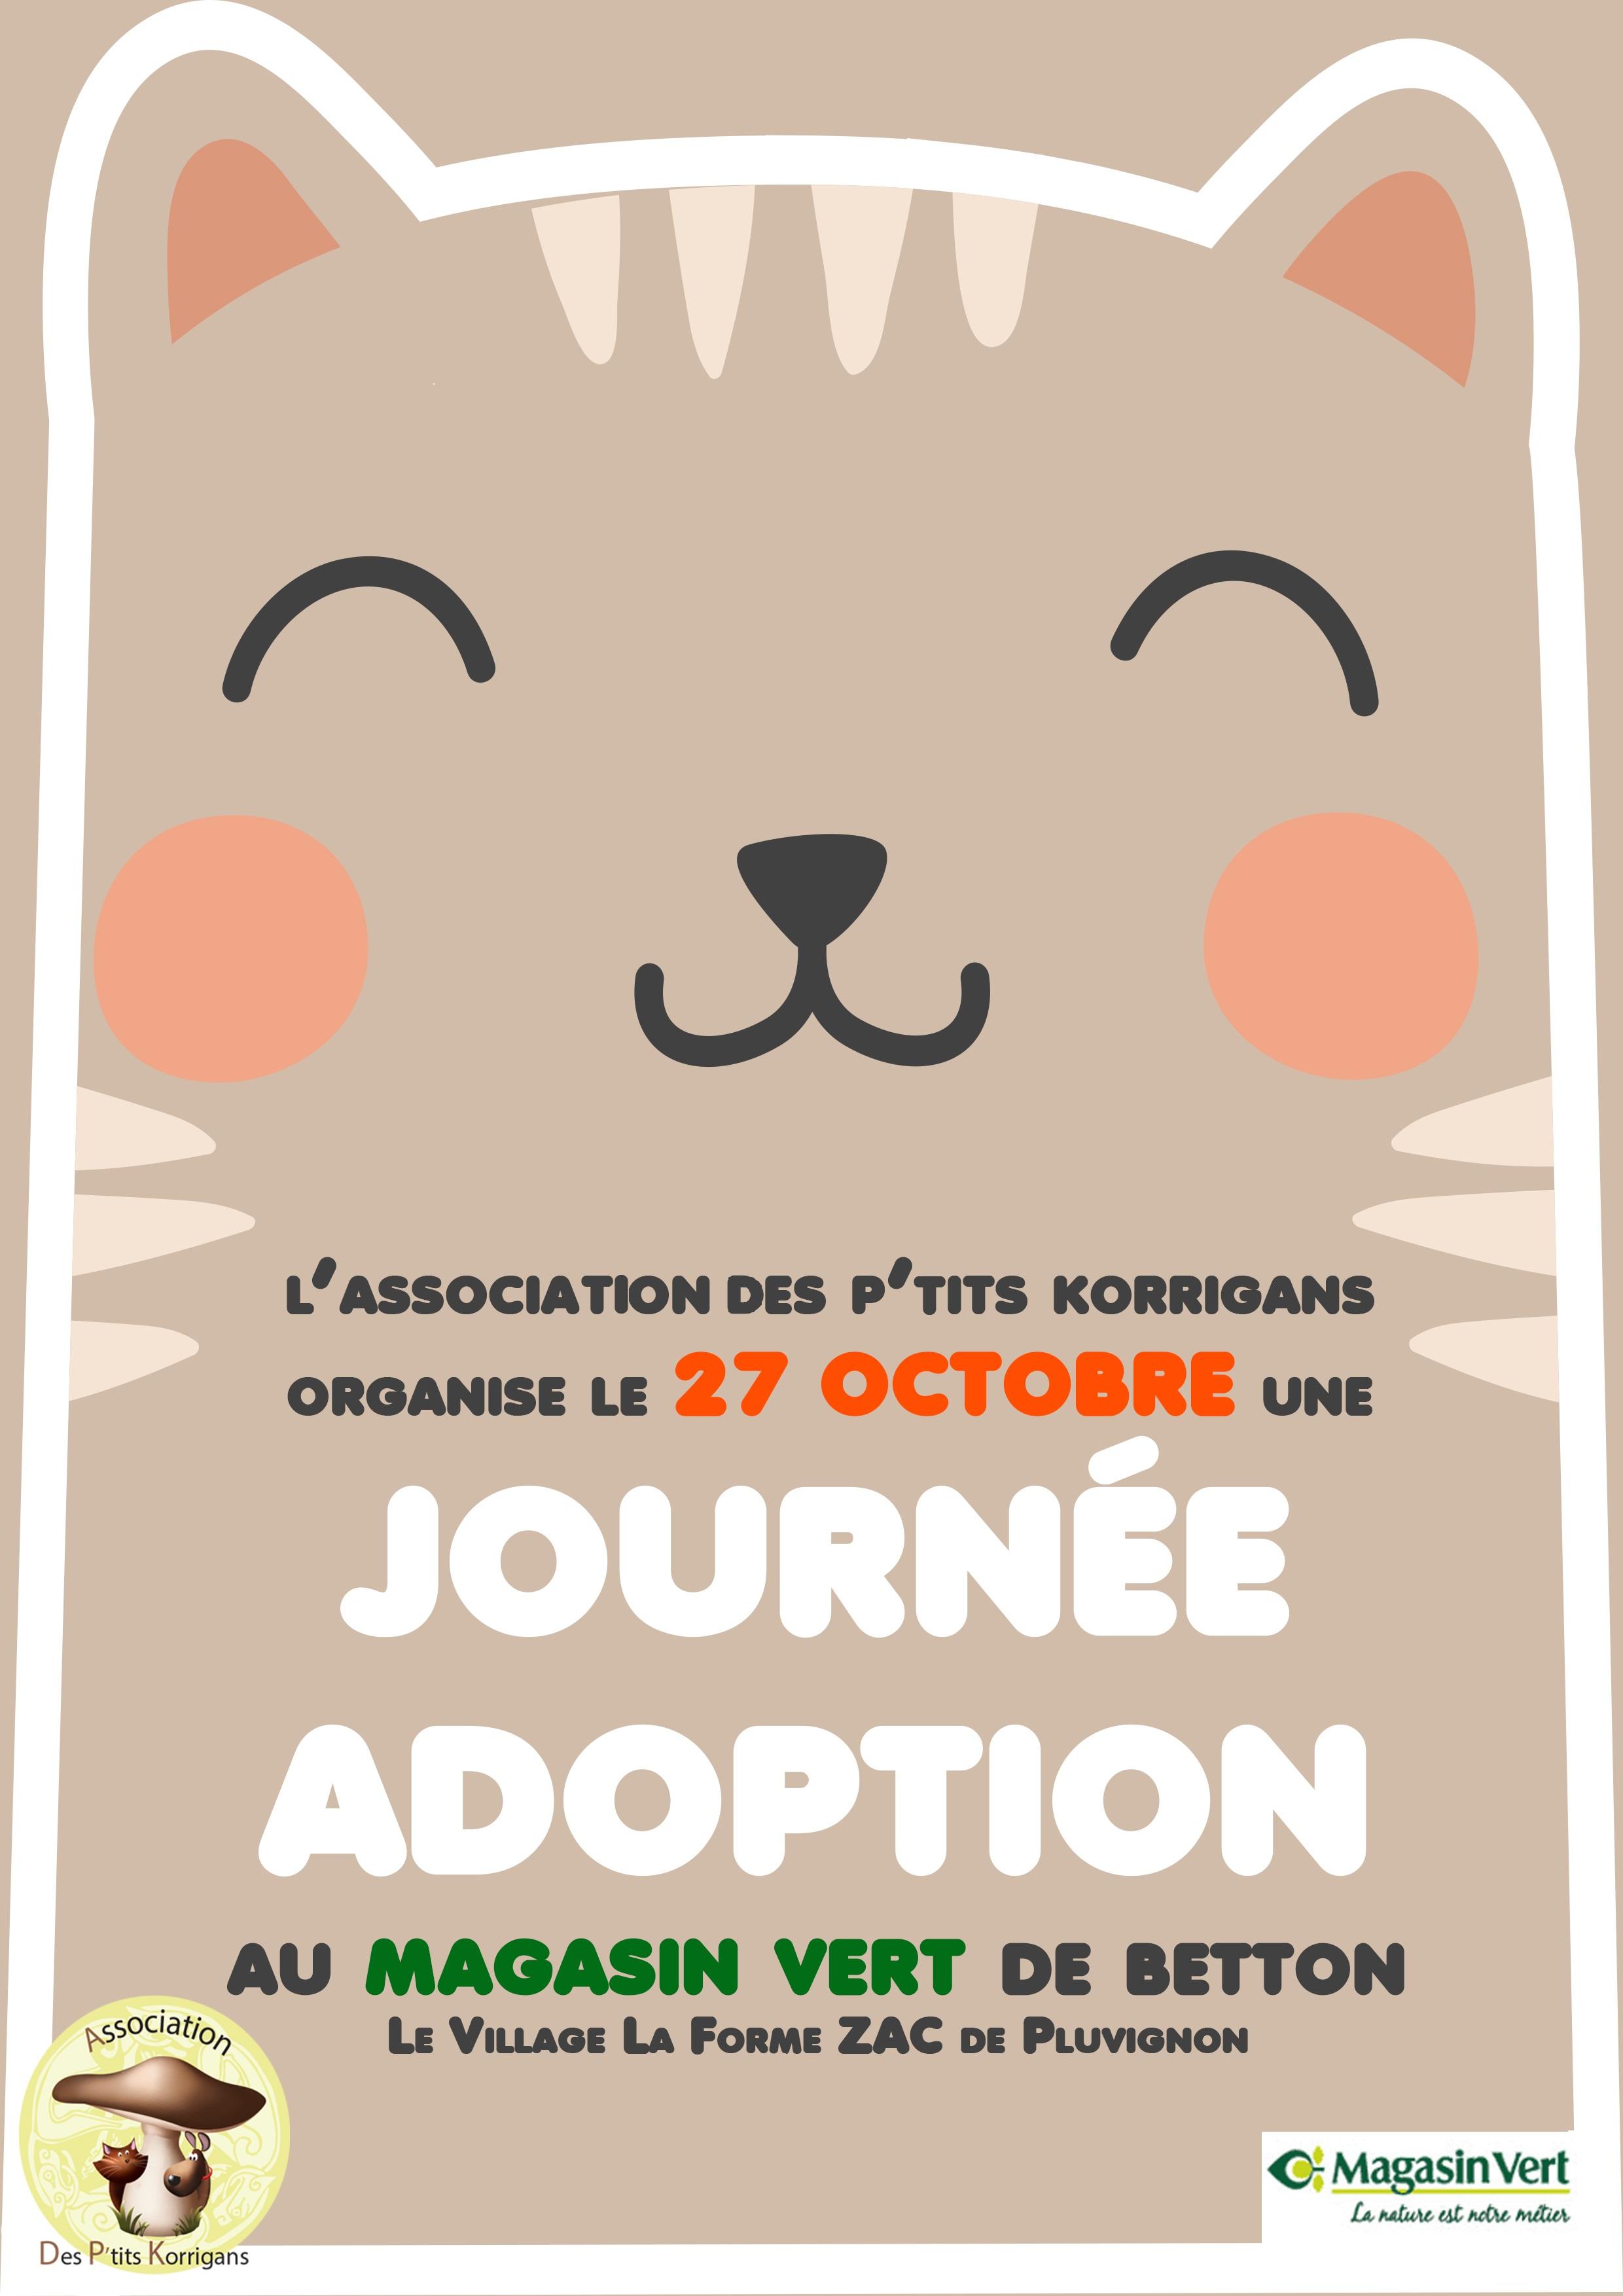 Journée adoption betton 27 octobre v2.jpg